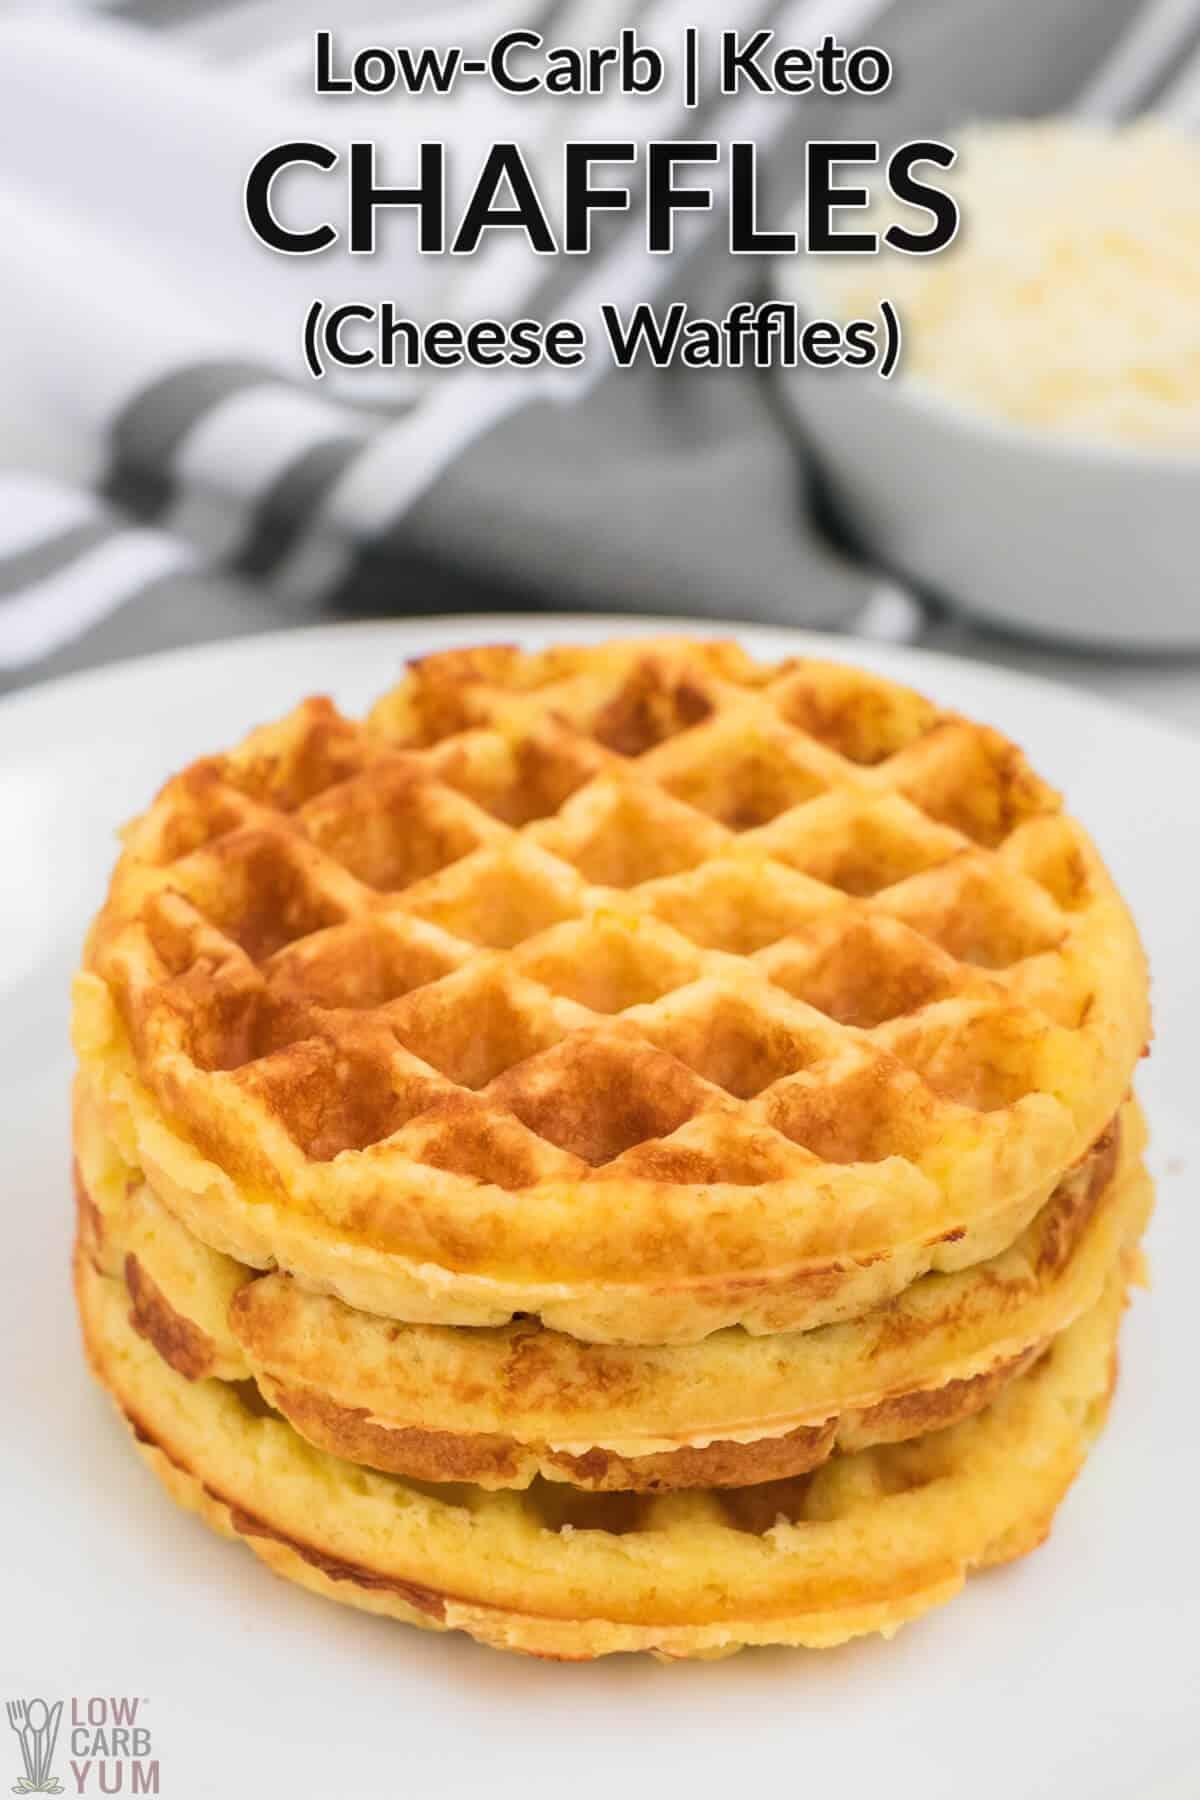 keto chaffles cheese waffles recipe cover image